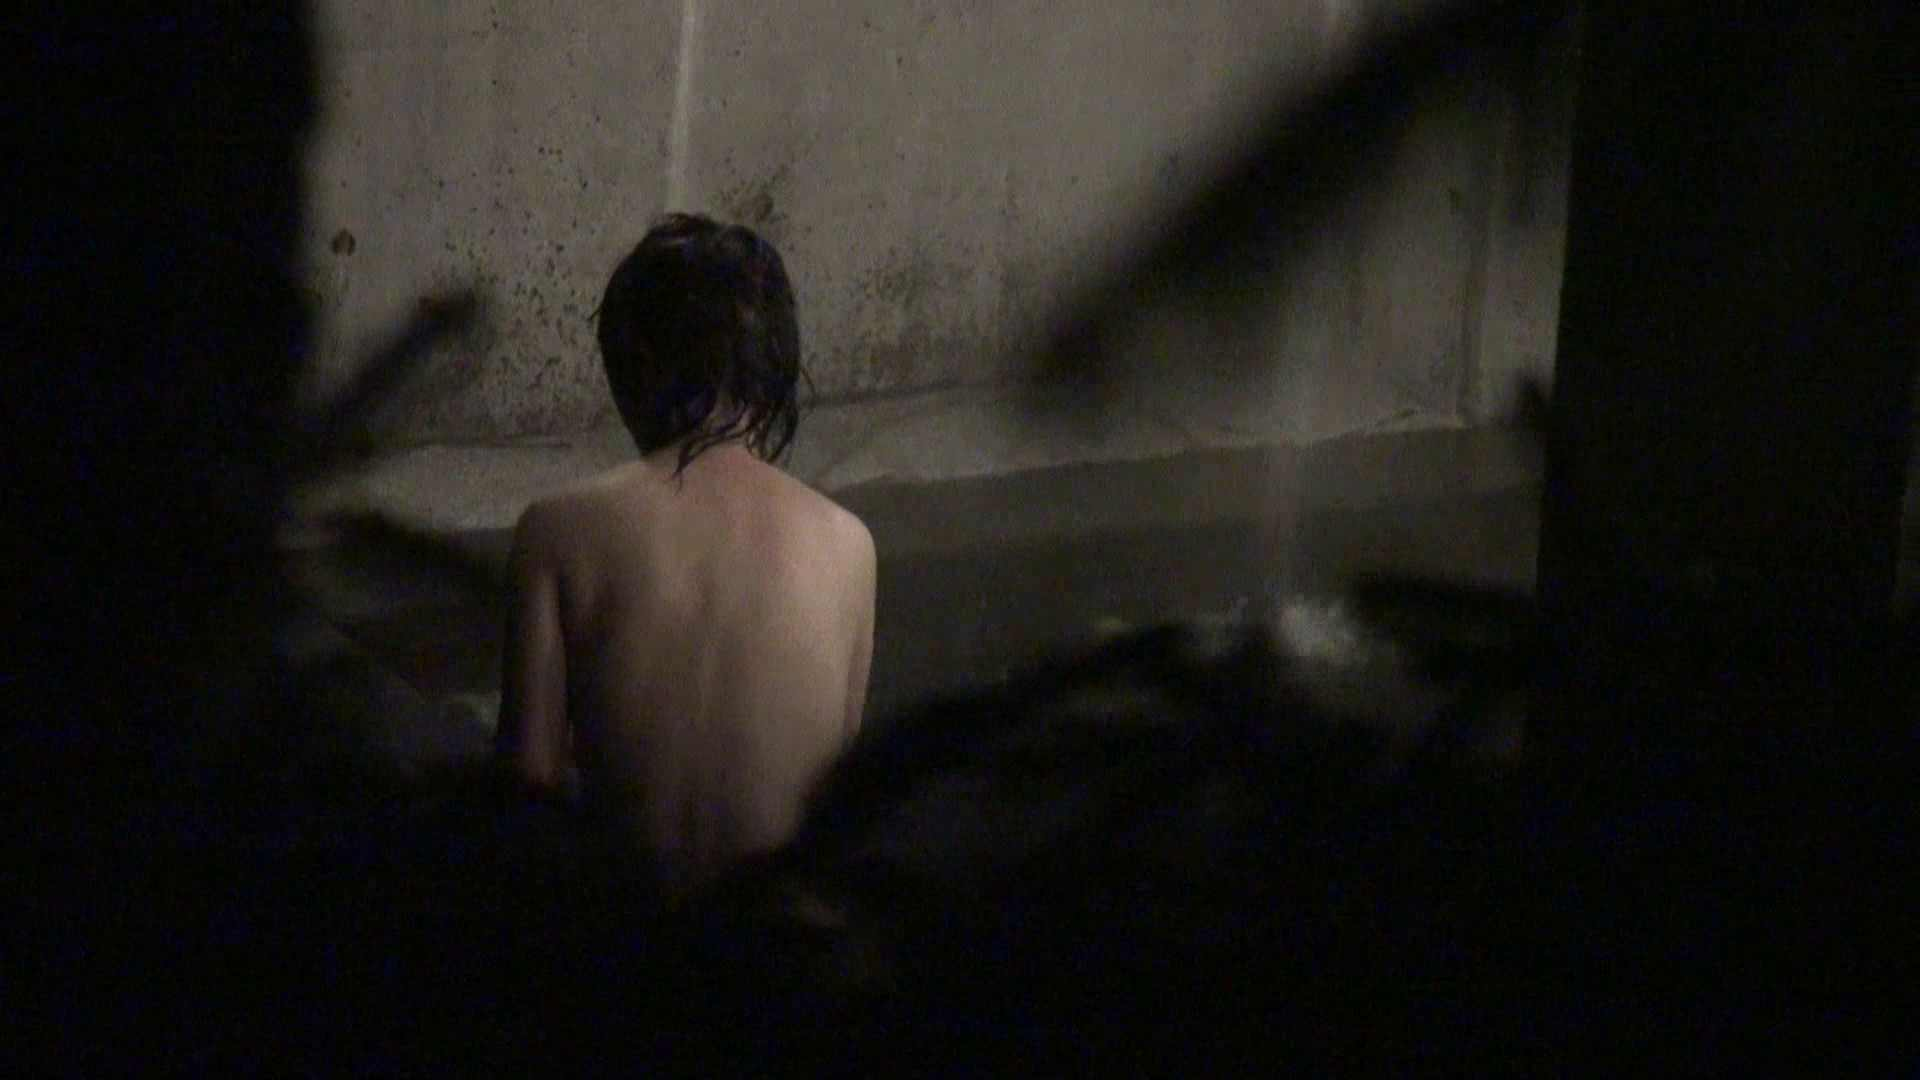 Aquaな露天風呂Vol.392 盗撮 オマンコ無修正動画無料 96画像 17